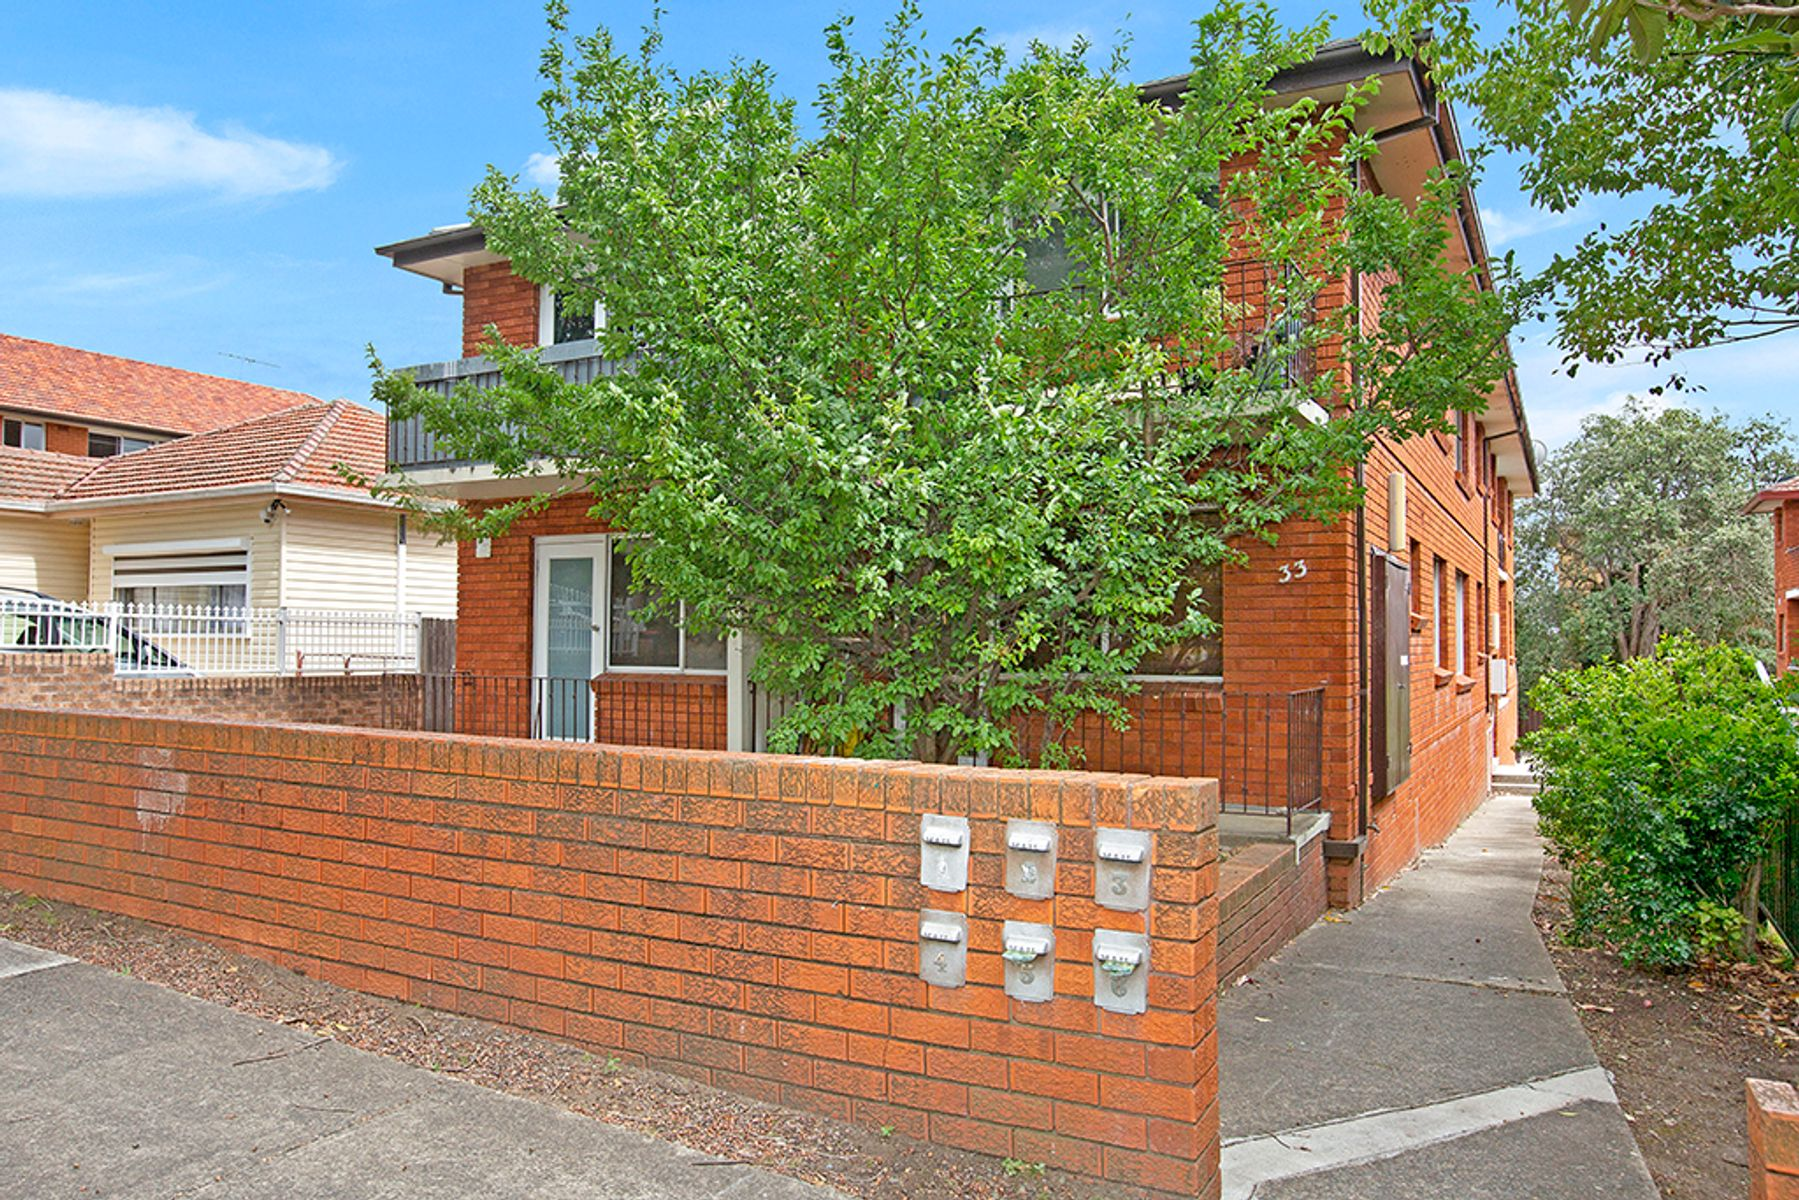 2/33 York Street, Belmore, NSW 2192